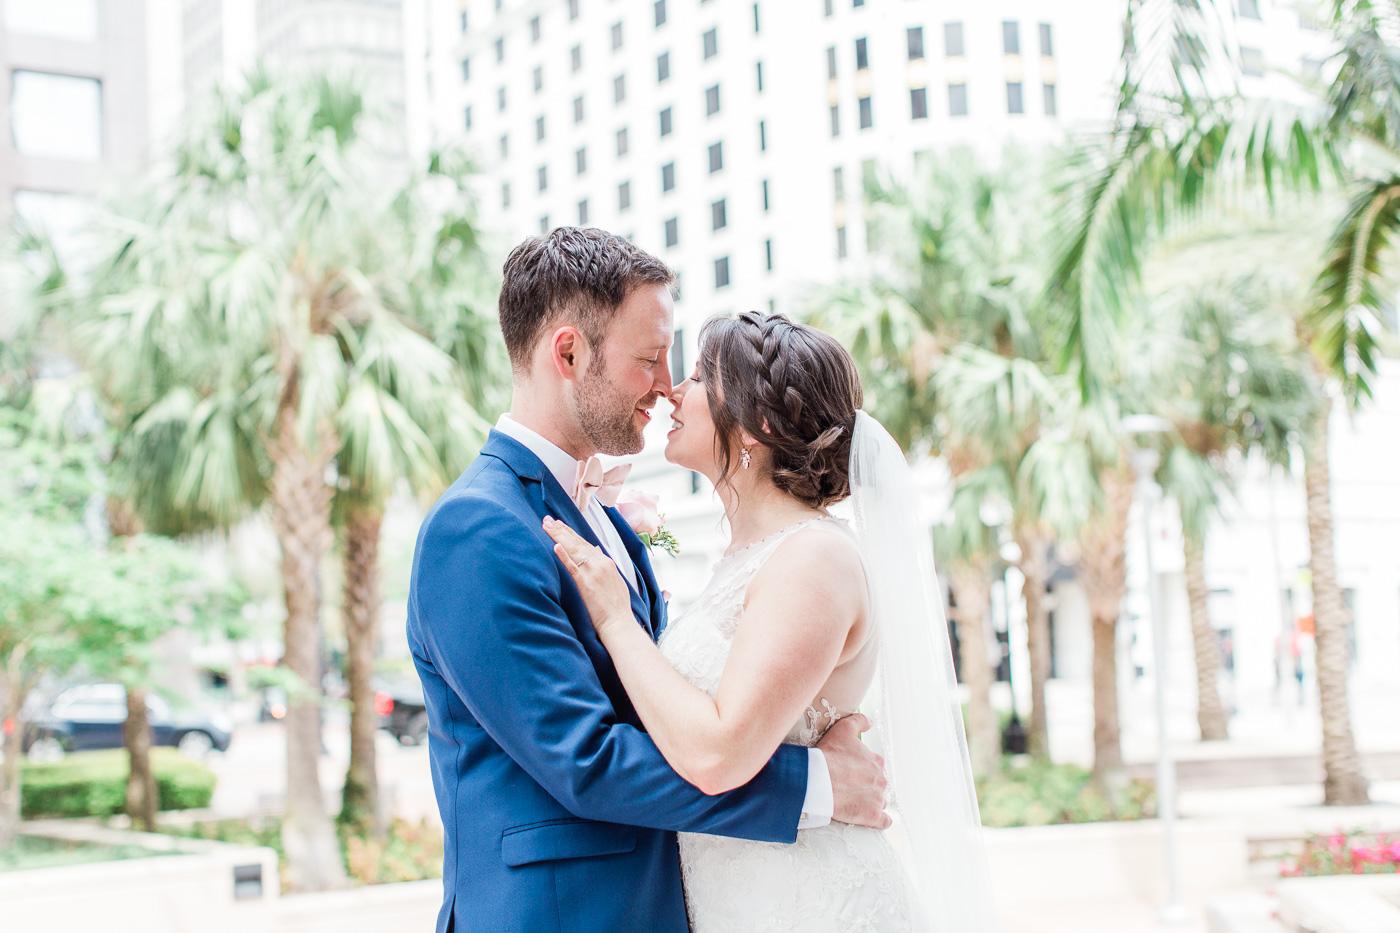 Orlando-Wedding-8.jpg